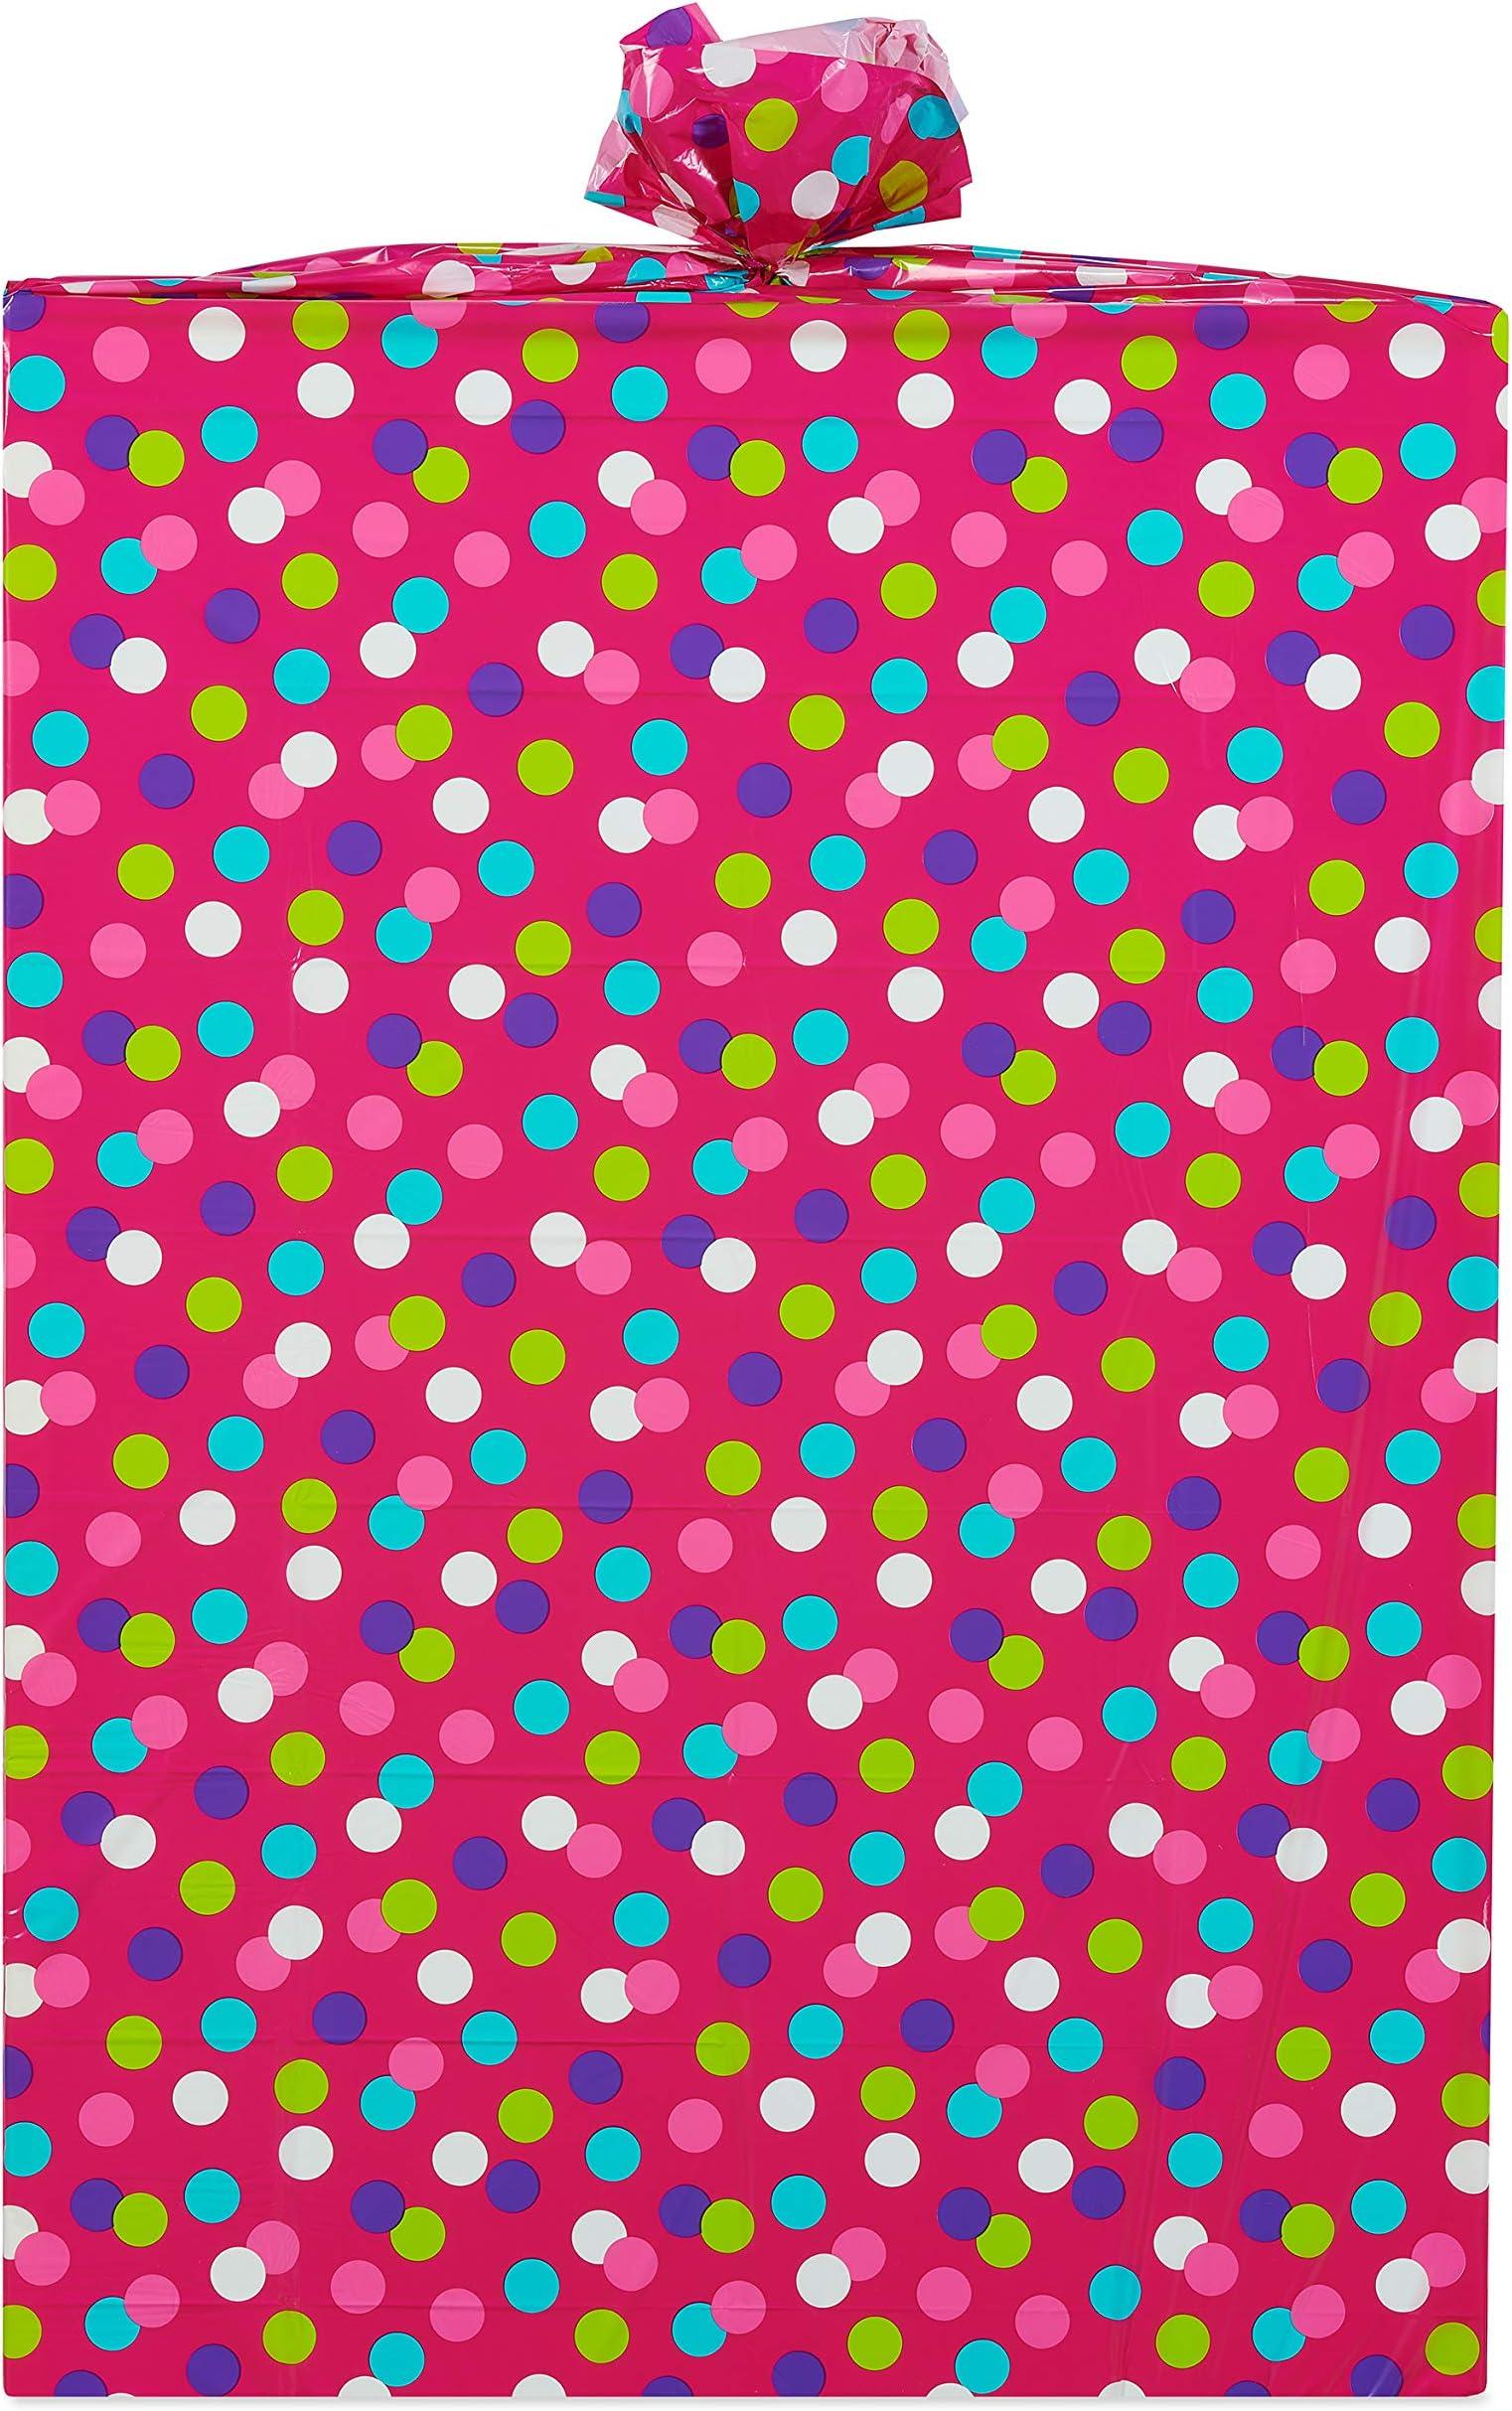 Pack of 12 SSF Pink Gift Bag with Orange Polka Dots